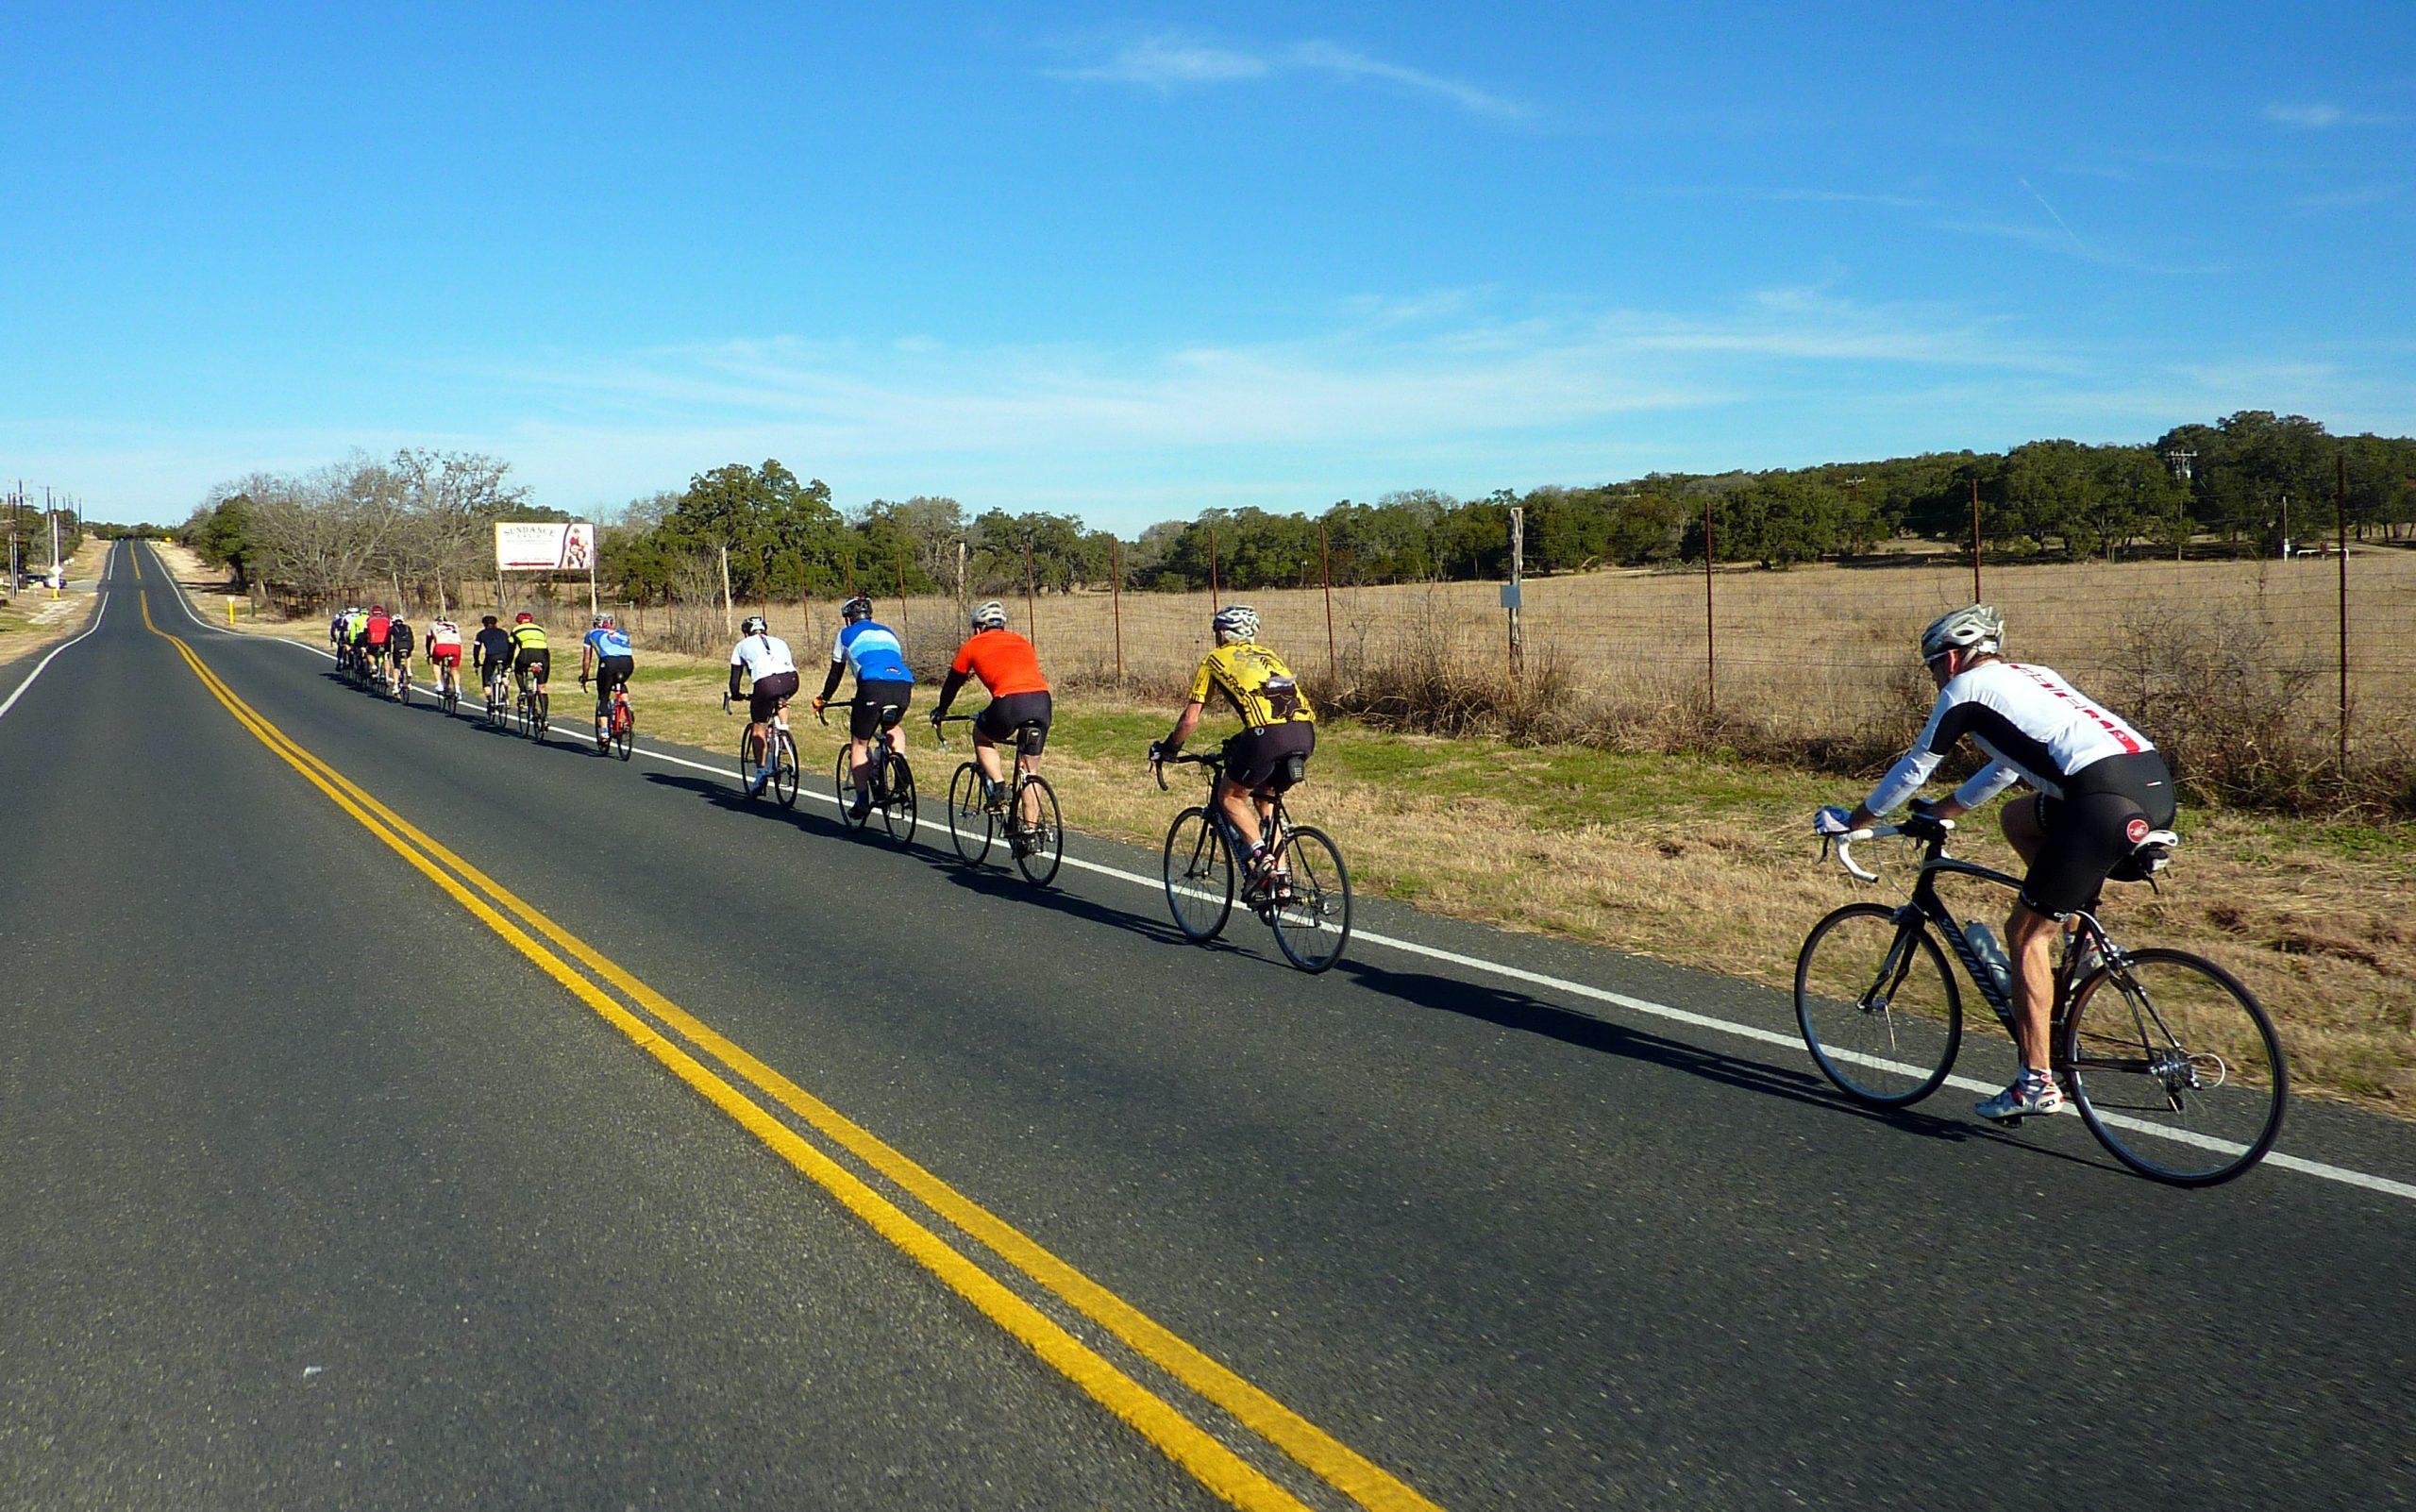 San Antonio Wheelmen ride in tandem through a rural road. Courtesy photo.